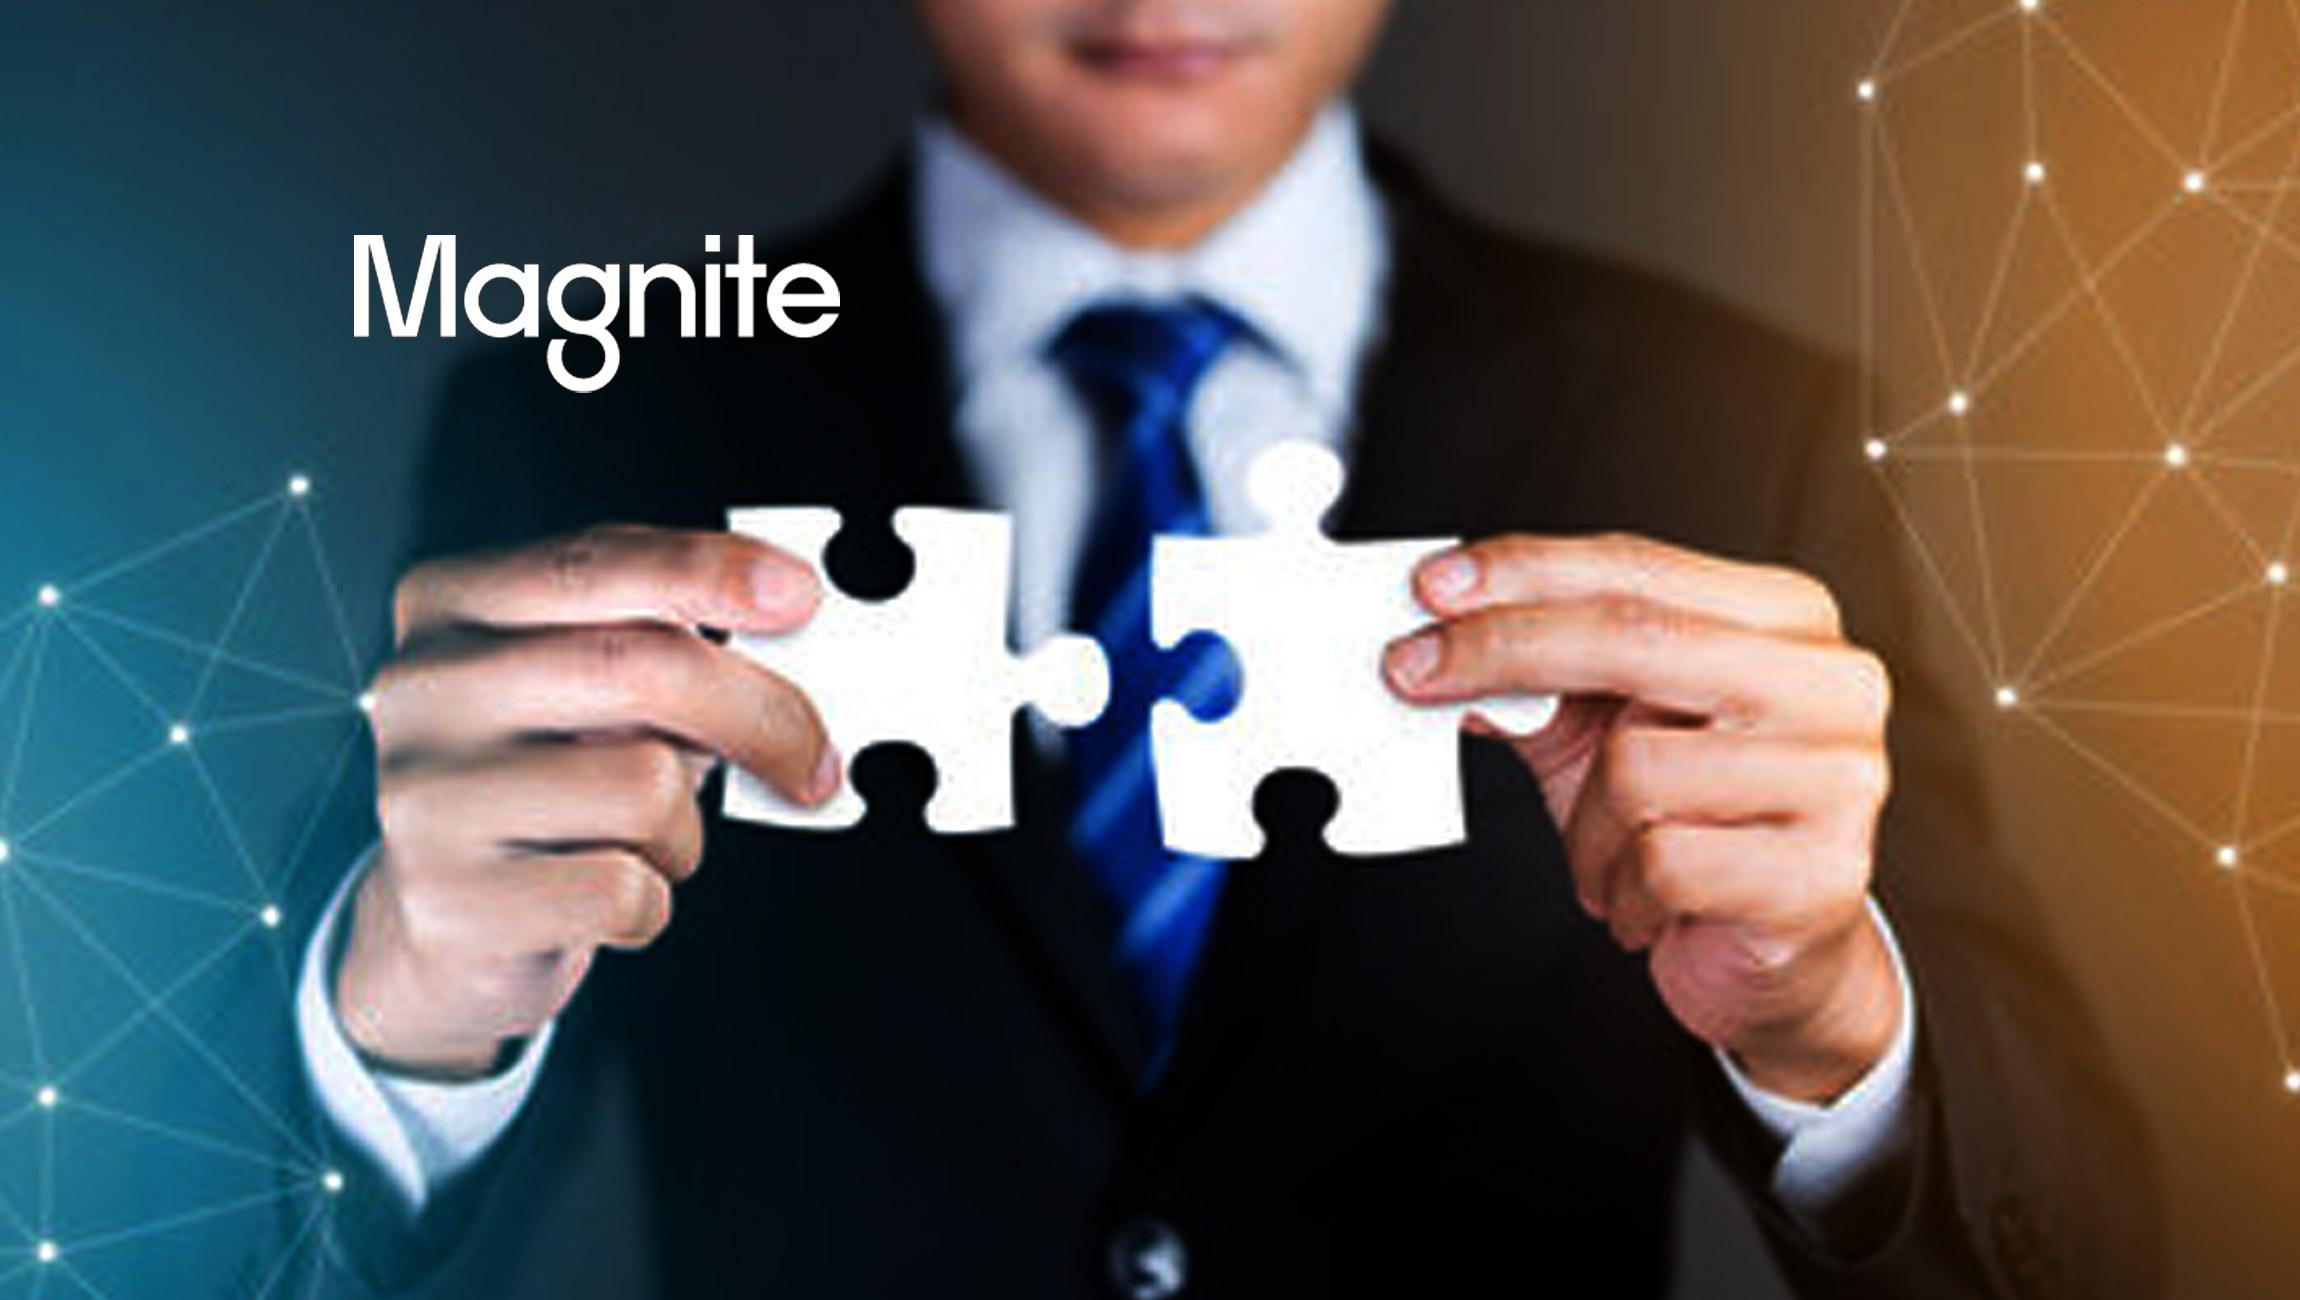 Magnite Announces Executive Leadership Team Following SpotX Acquisition 1